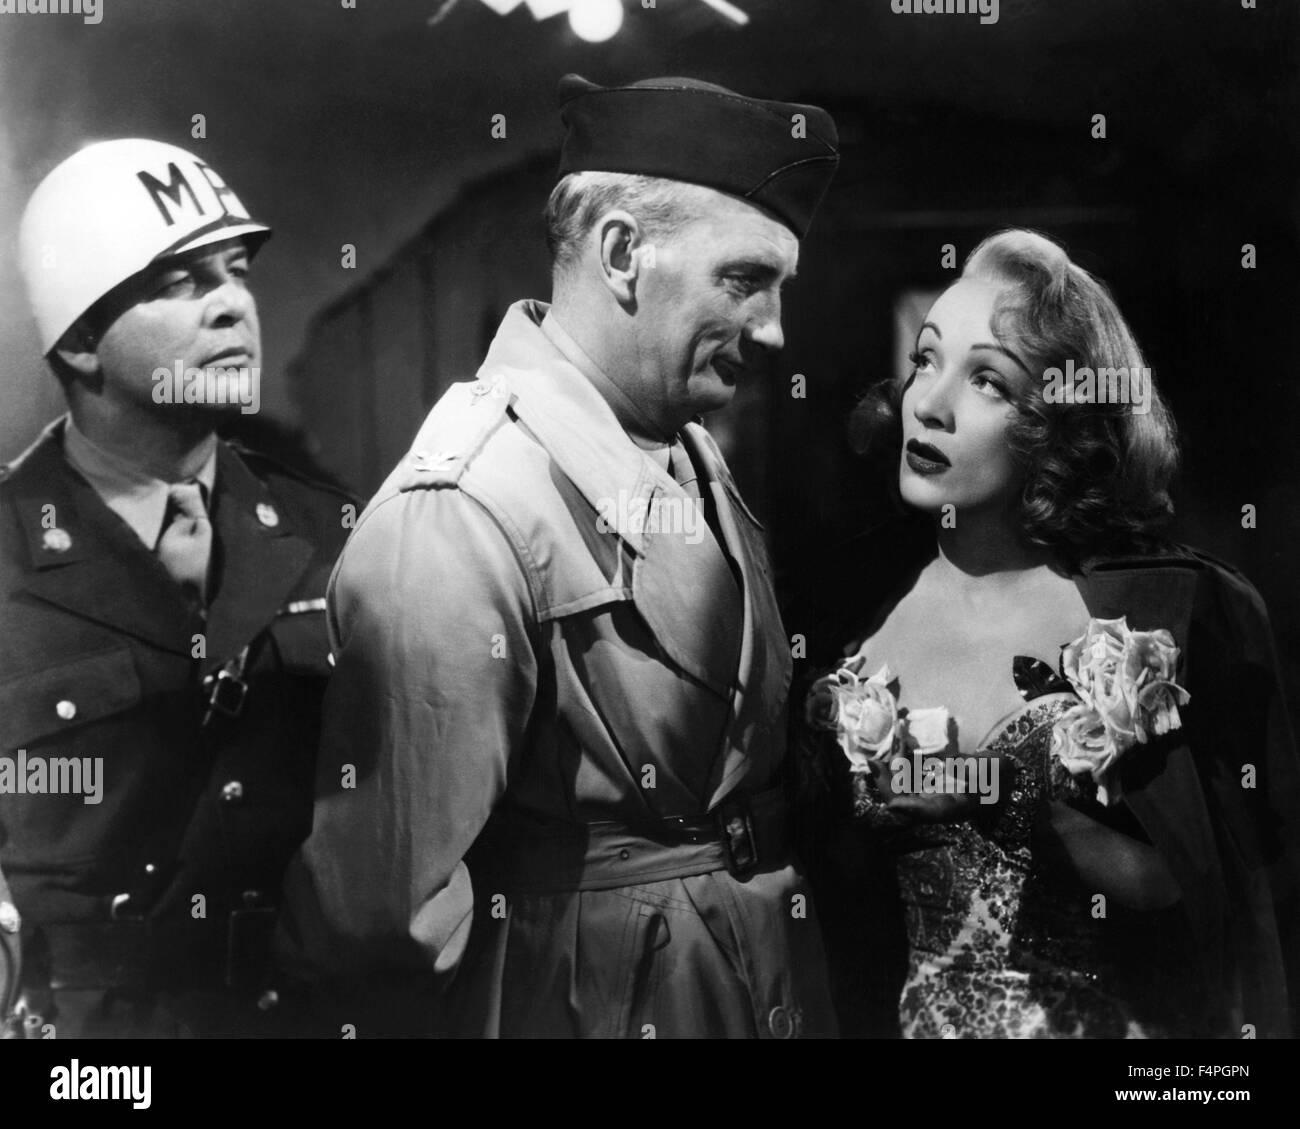 Millard Mitchell and Marlene Dietrich / A Foreign Affair / 1948 directed by Billy Wilder - Stock Image